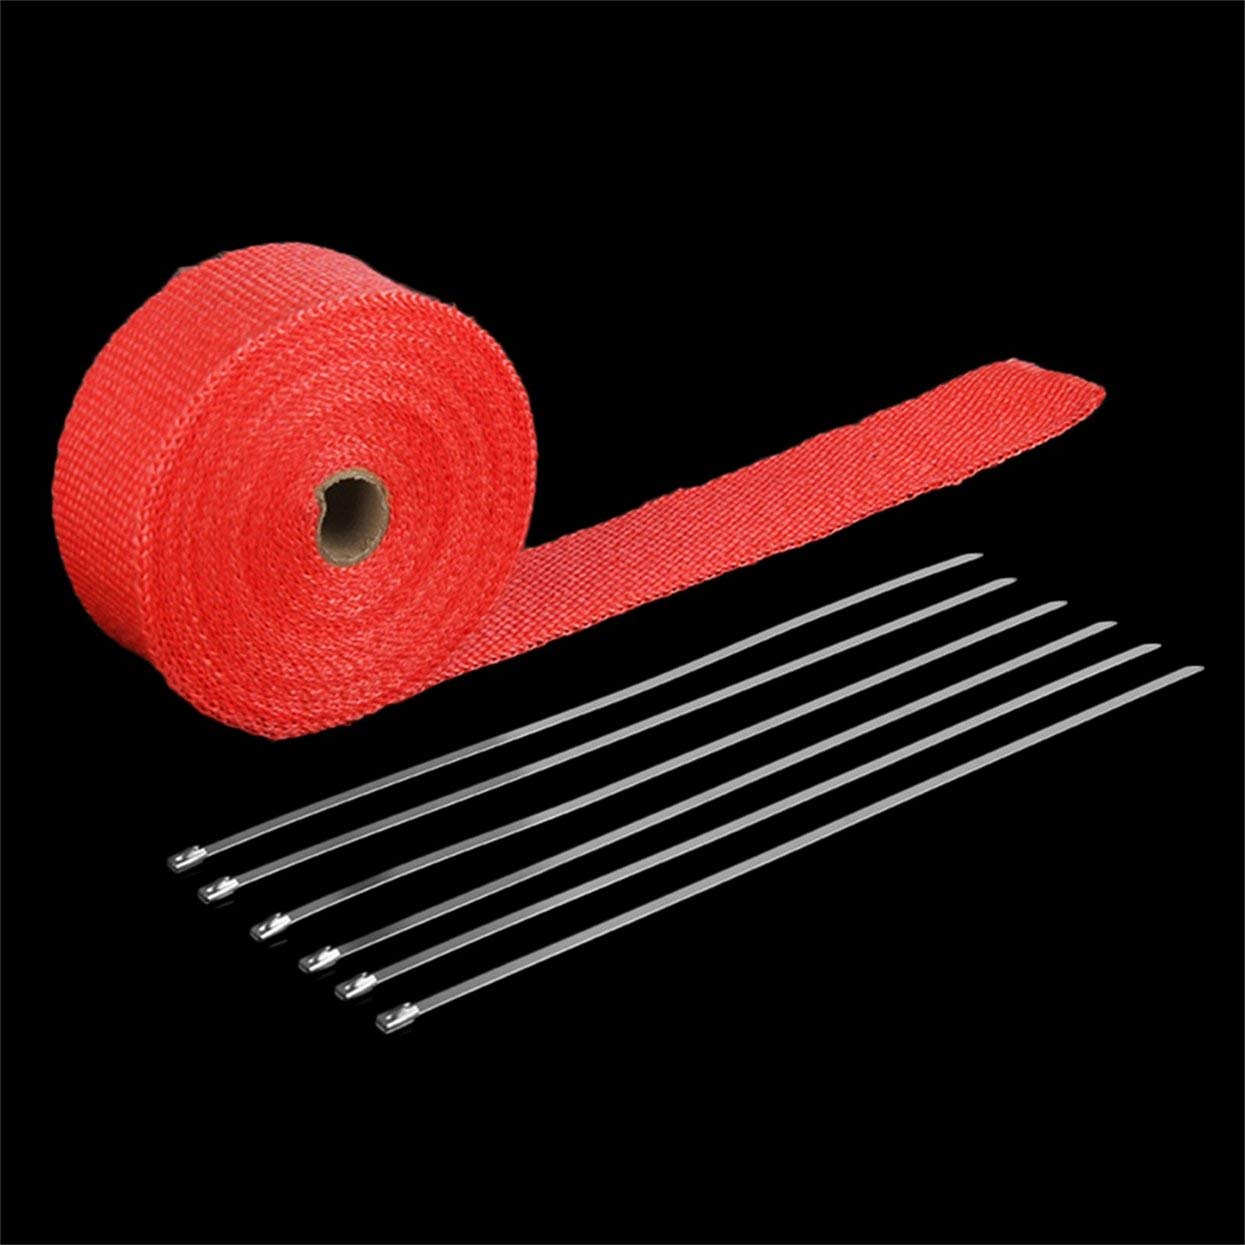 Rollo de fibra de vidrio, colector de escape, fibra de vidrio, cinta de envoltura té rmica con 6 lazos, kit de colectores de escape, cabezales, suministros, 1.5 mm * 50 mm * 5 m, rojo cinta de envoltura térmica con 6 lazos LoveOlvidoE